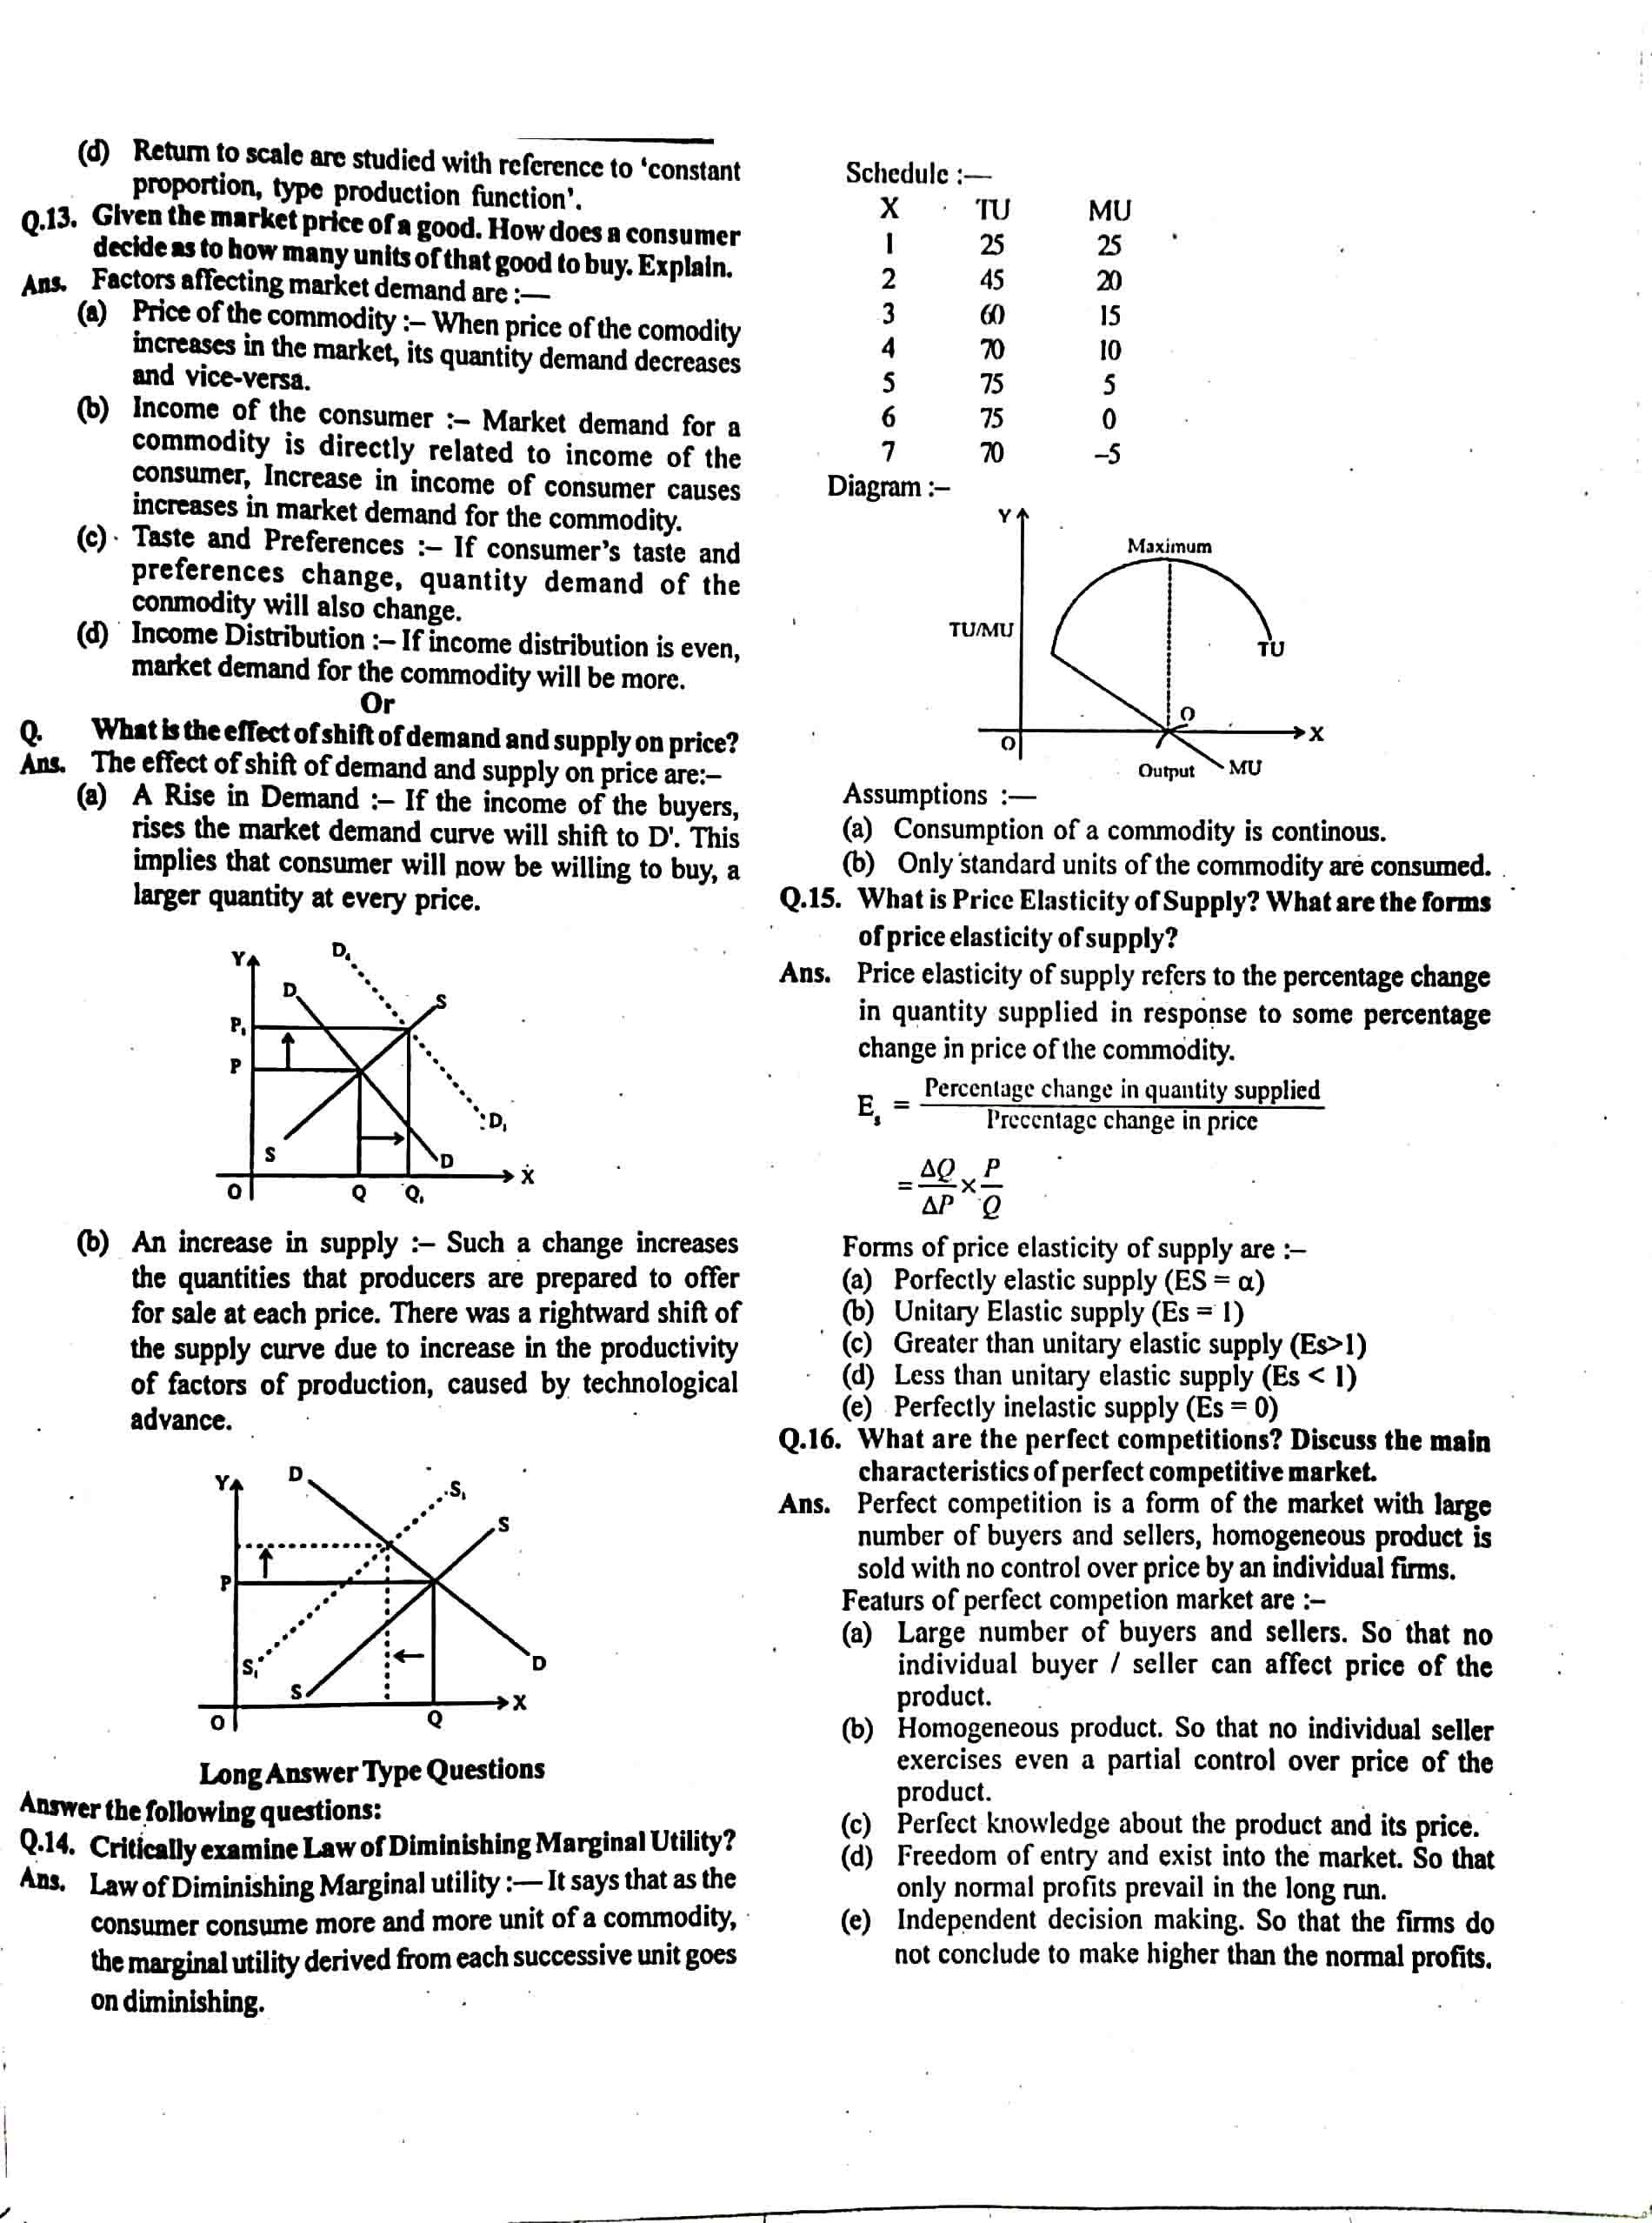 JAC Class 12 economics 2015 Question Paper 02